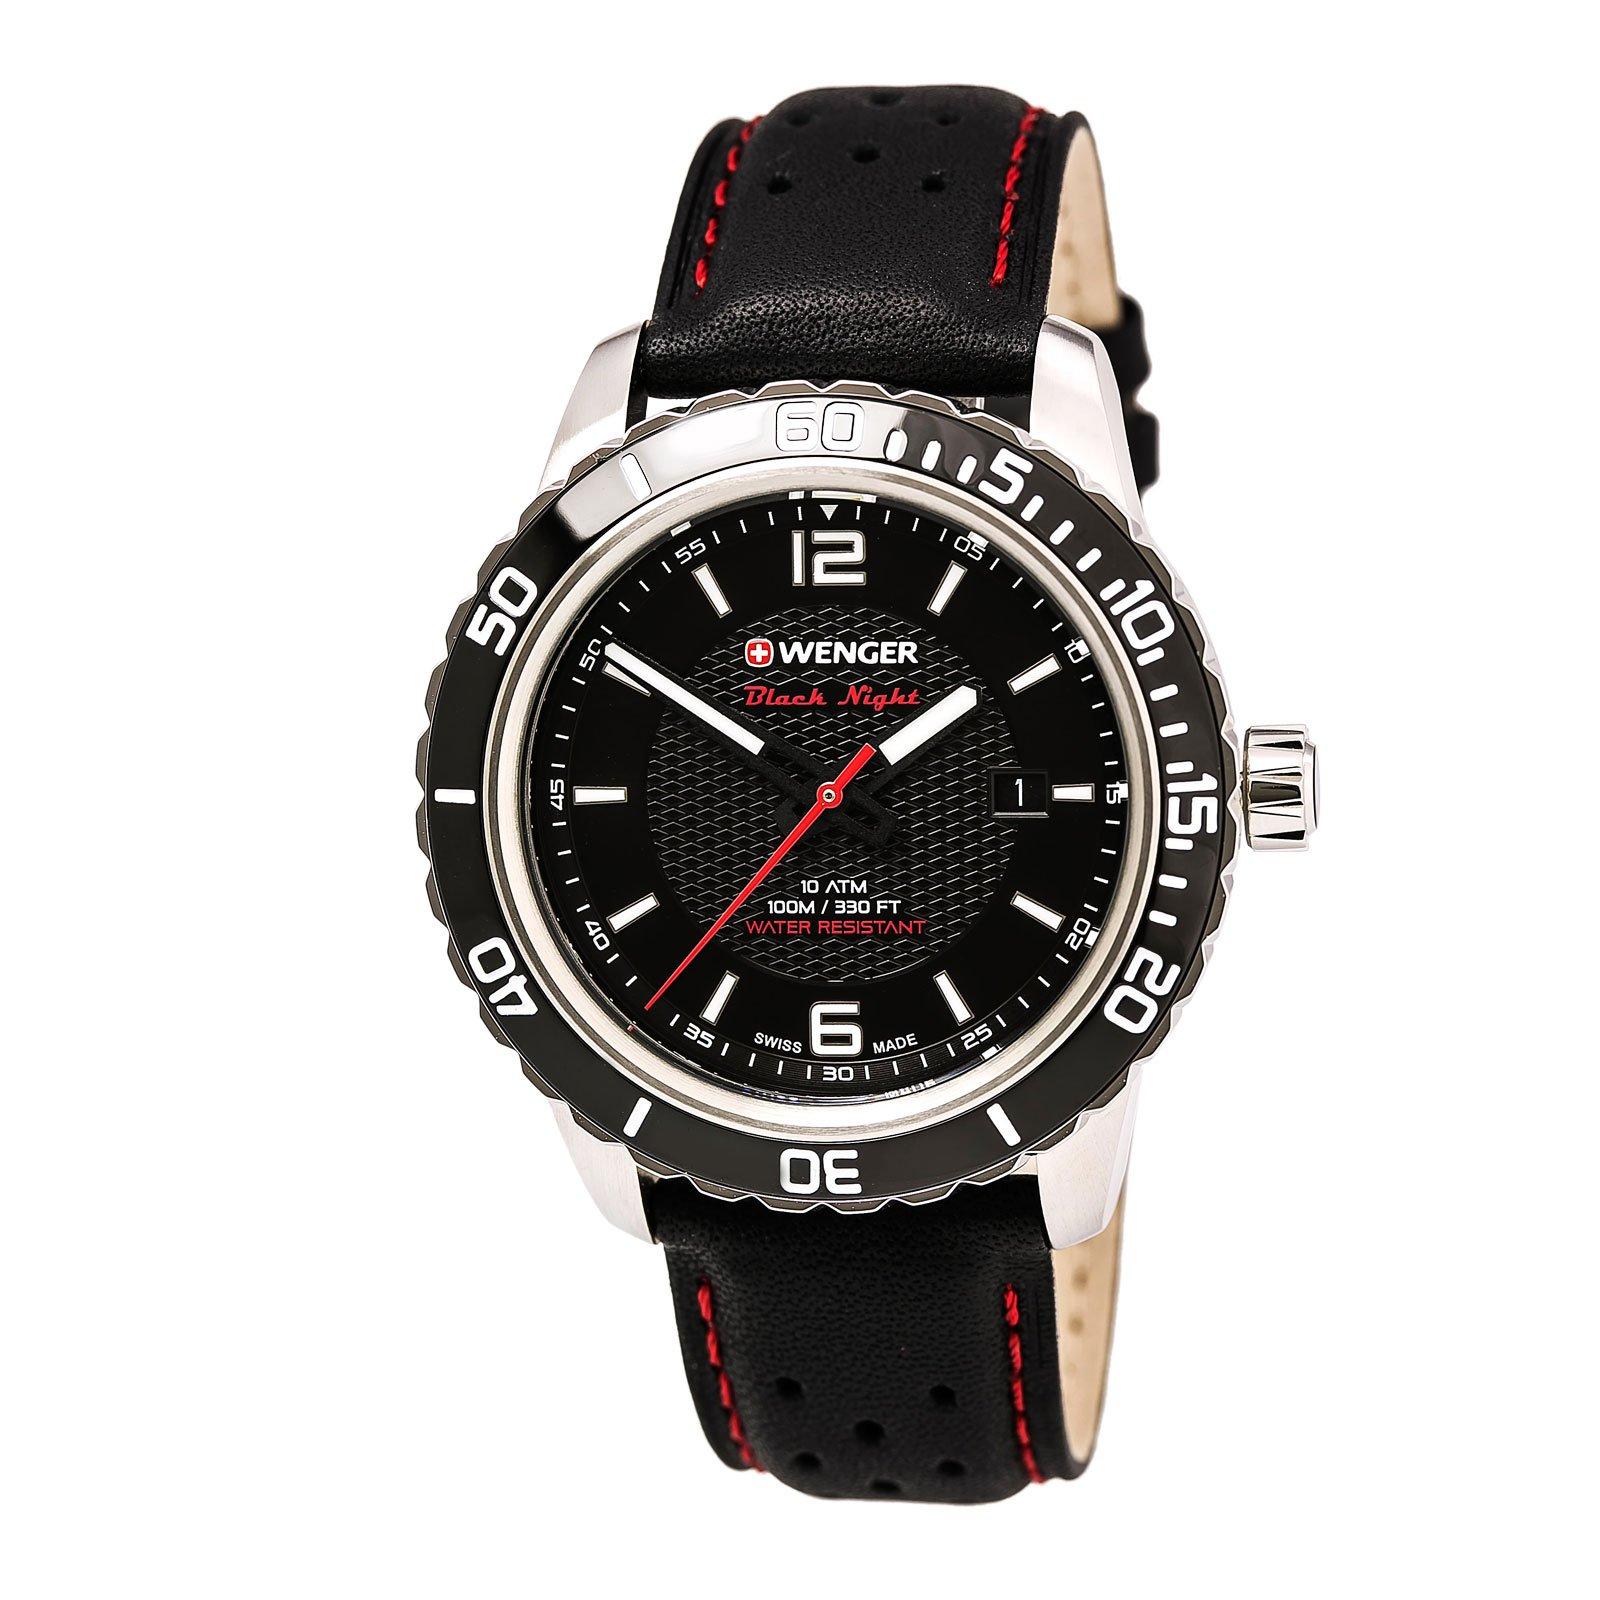 Wenger 01.0851.120 Men's Roadster Black Night Black Dial Black Leather Strap Watch